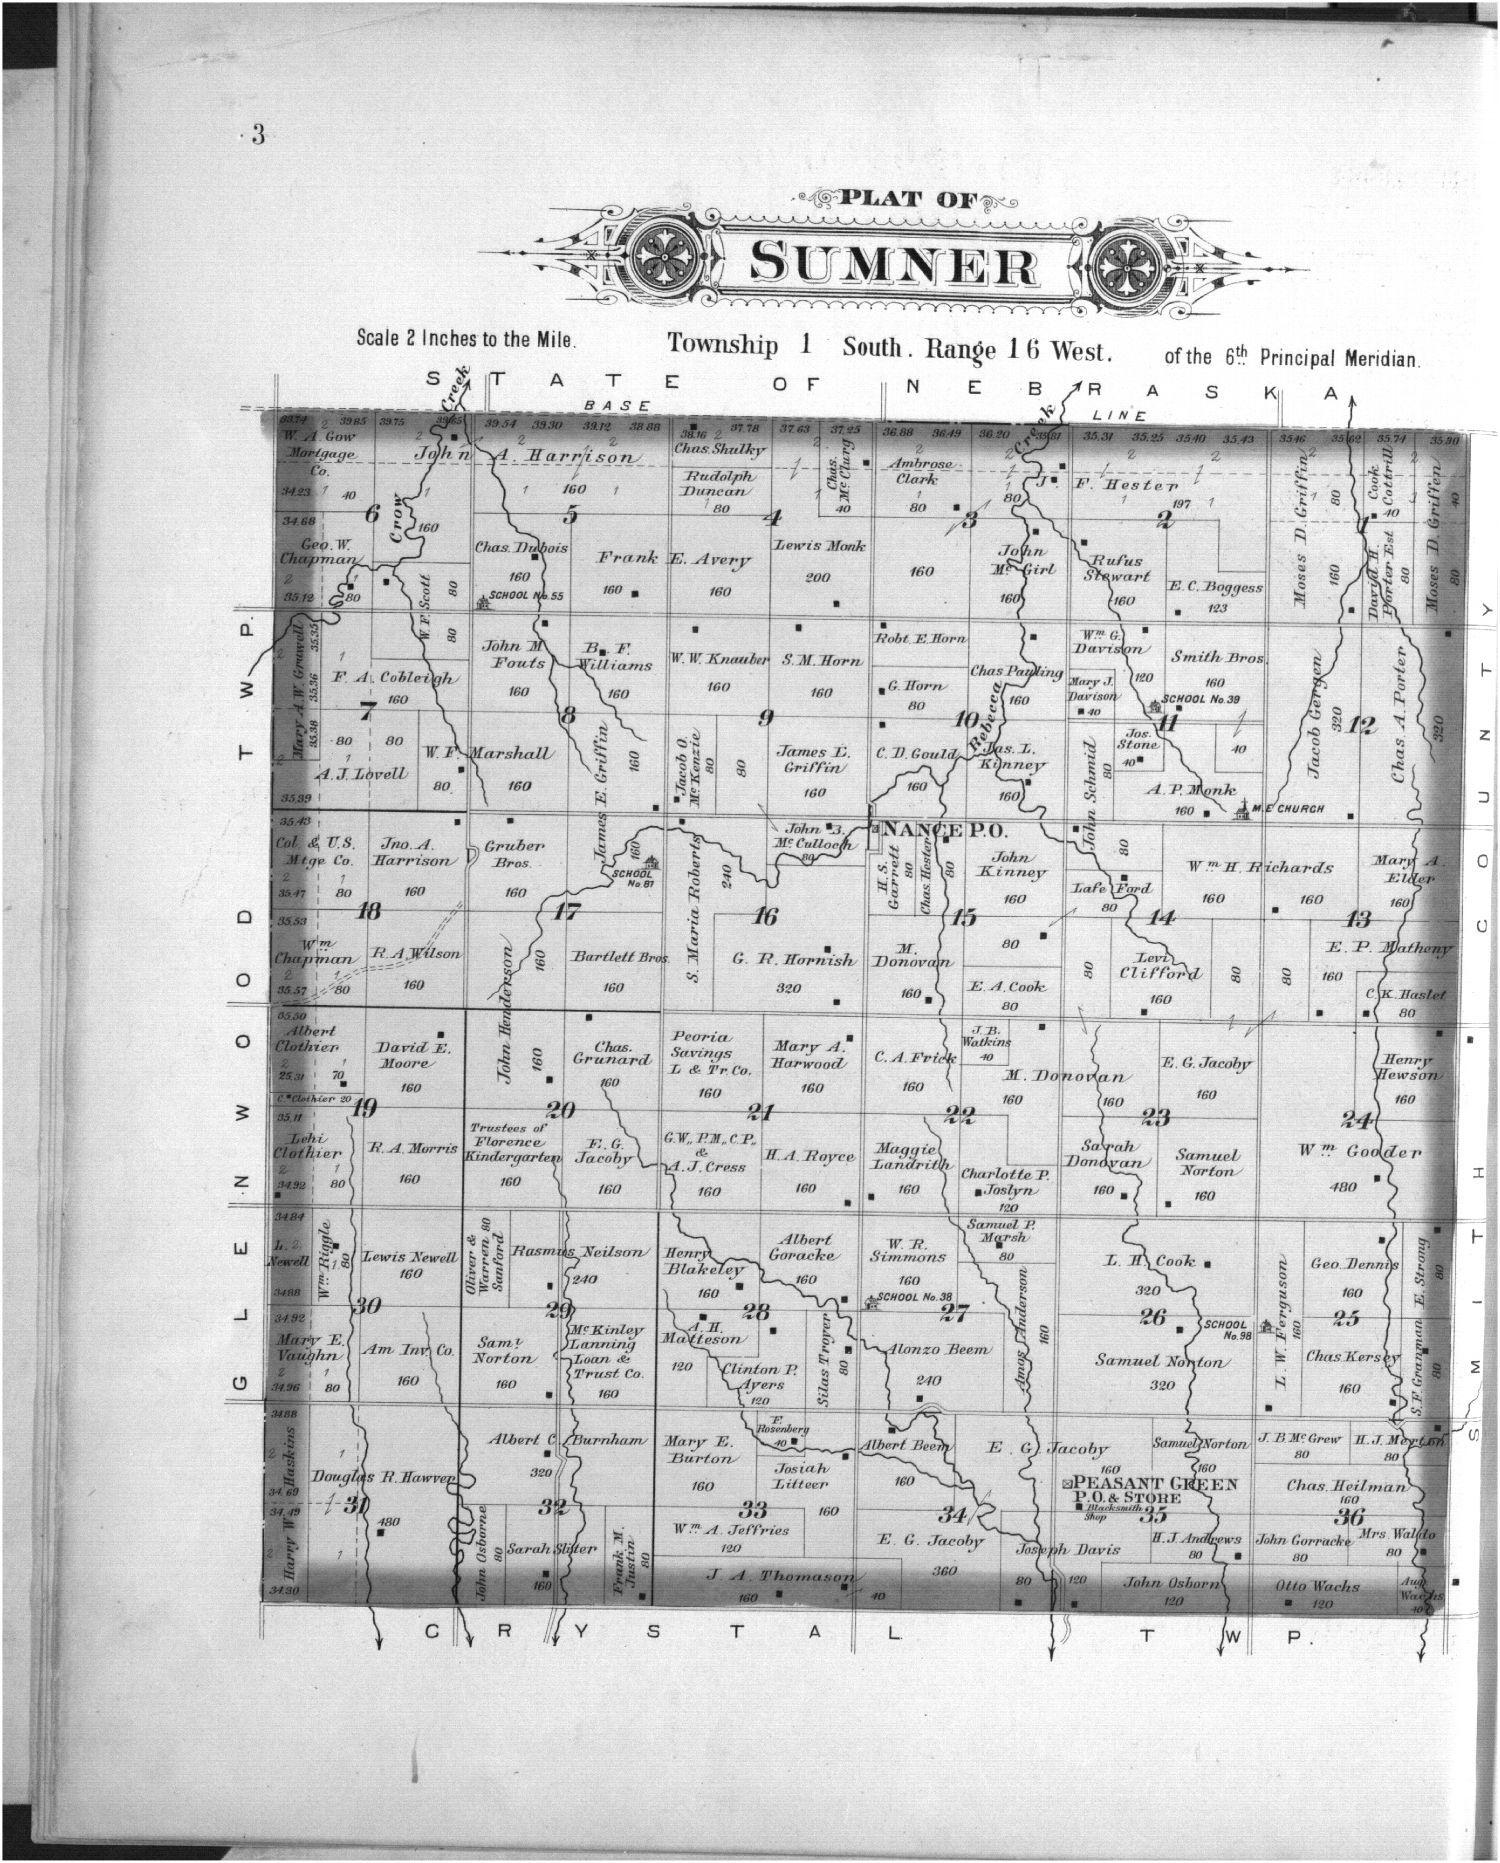 Plat book, Phillips County, Kansas - 3